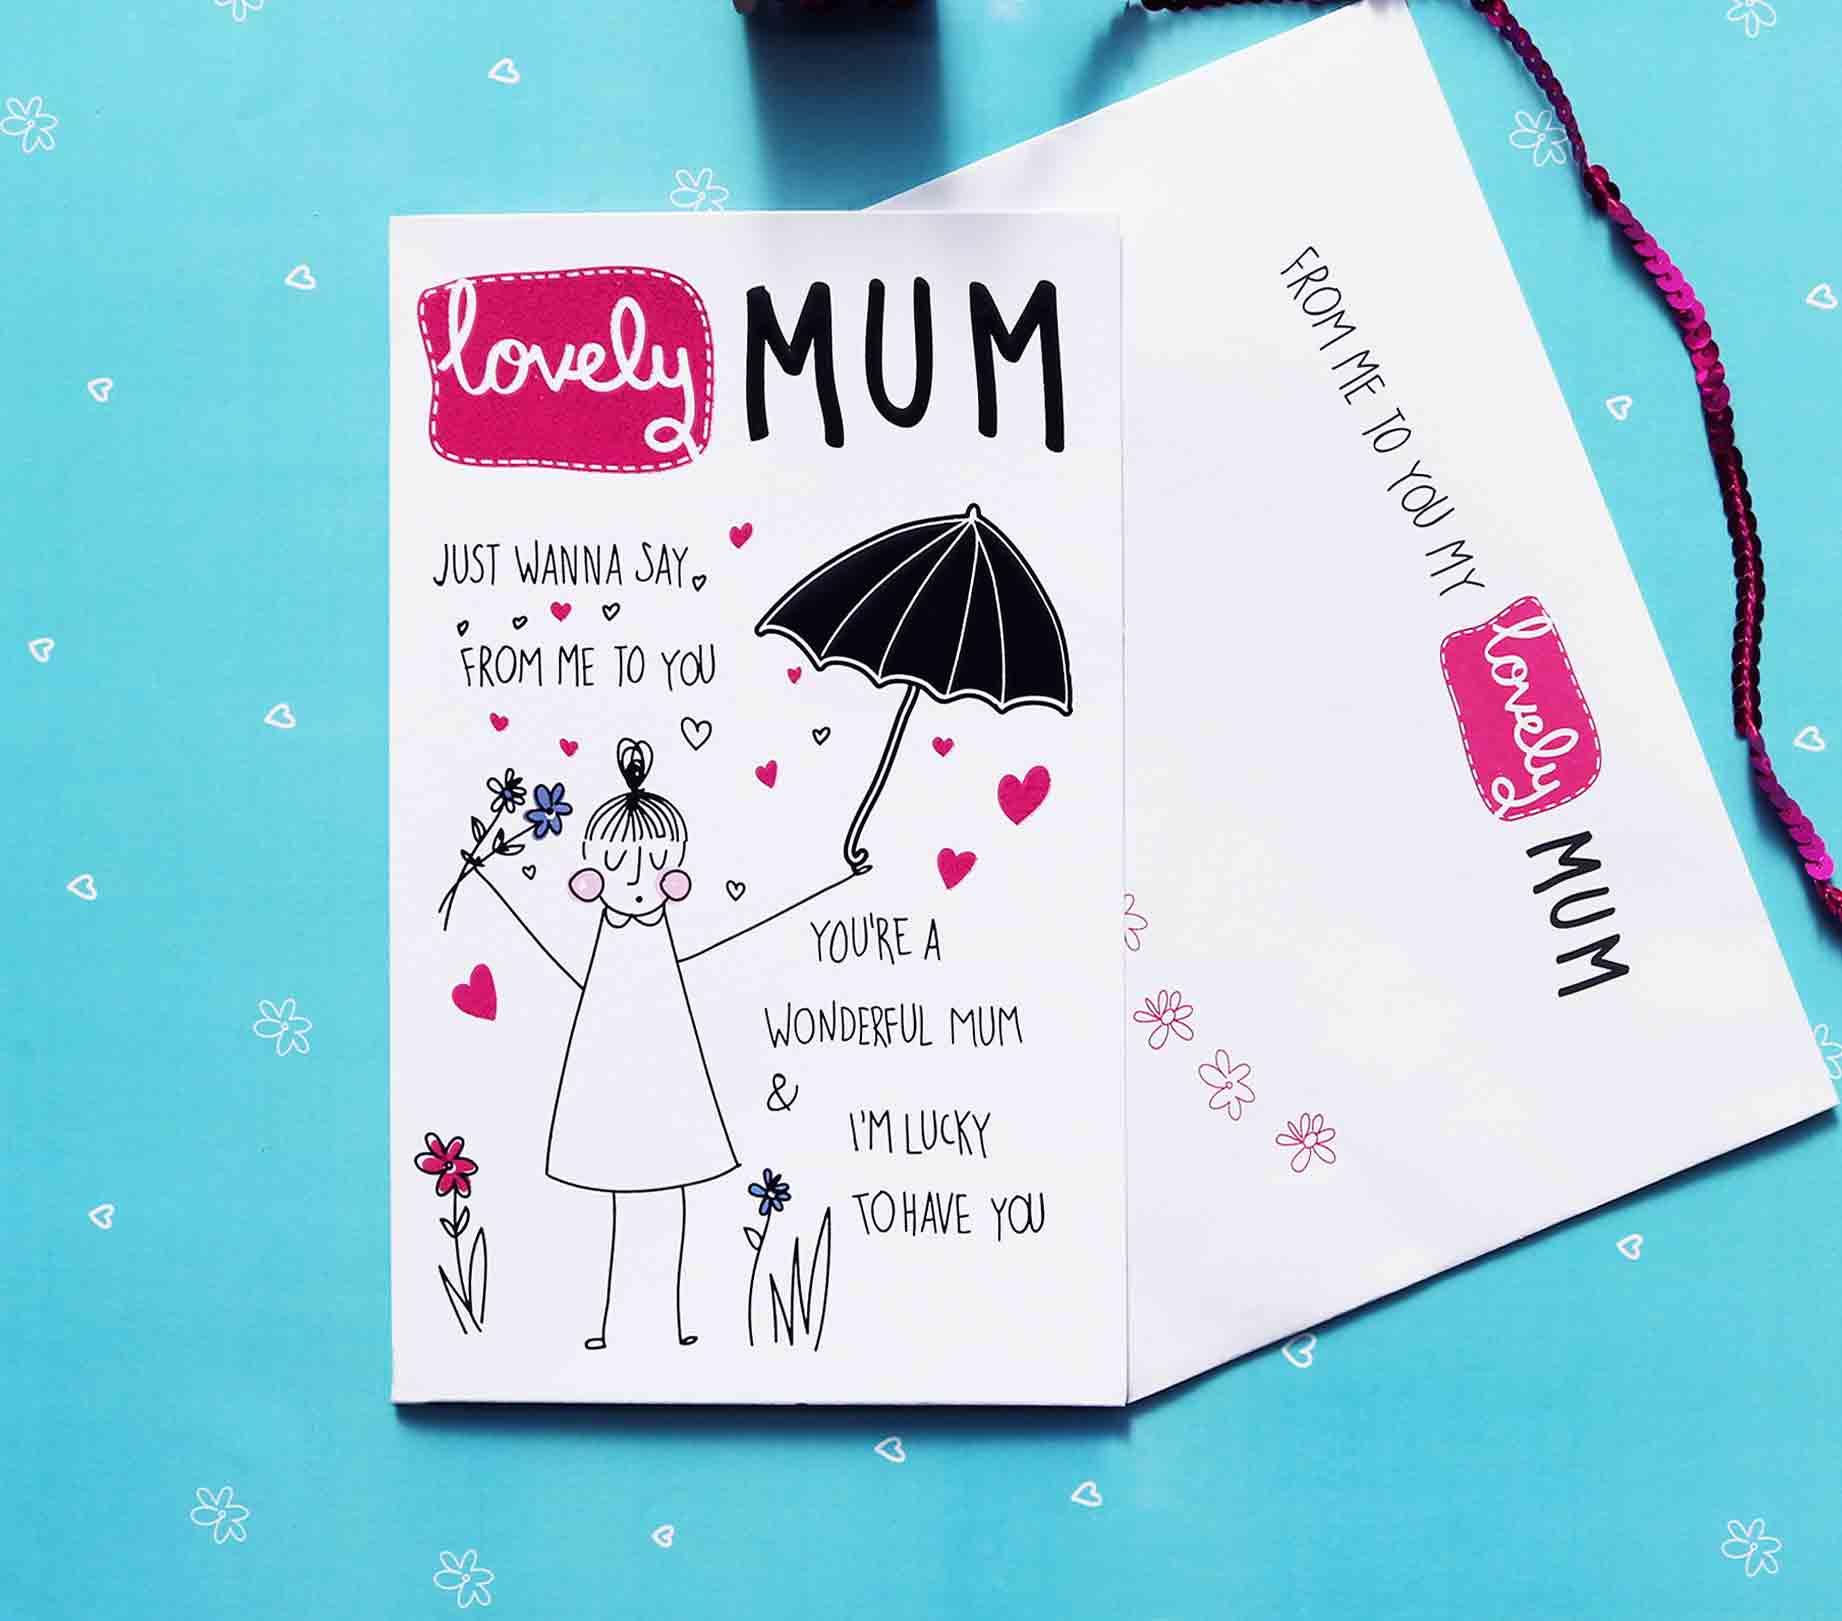 Lovely mum birthday card